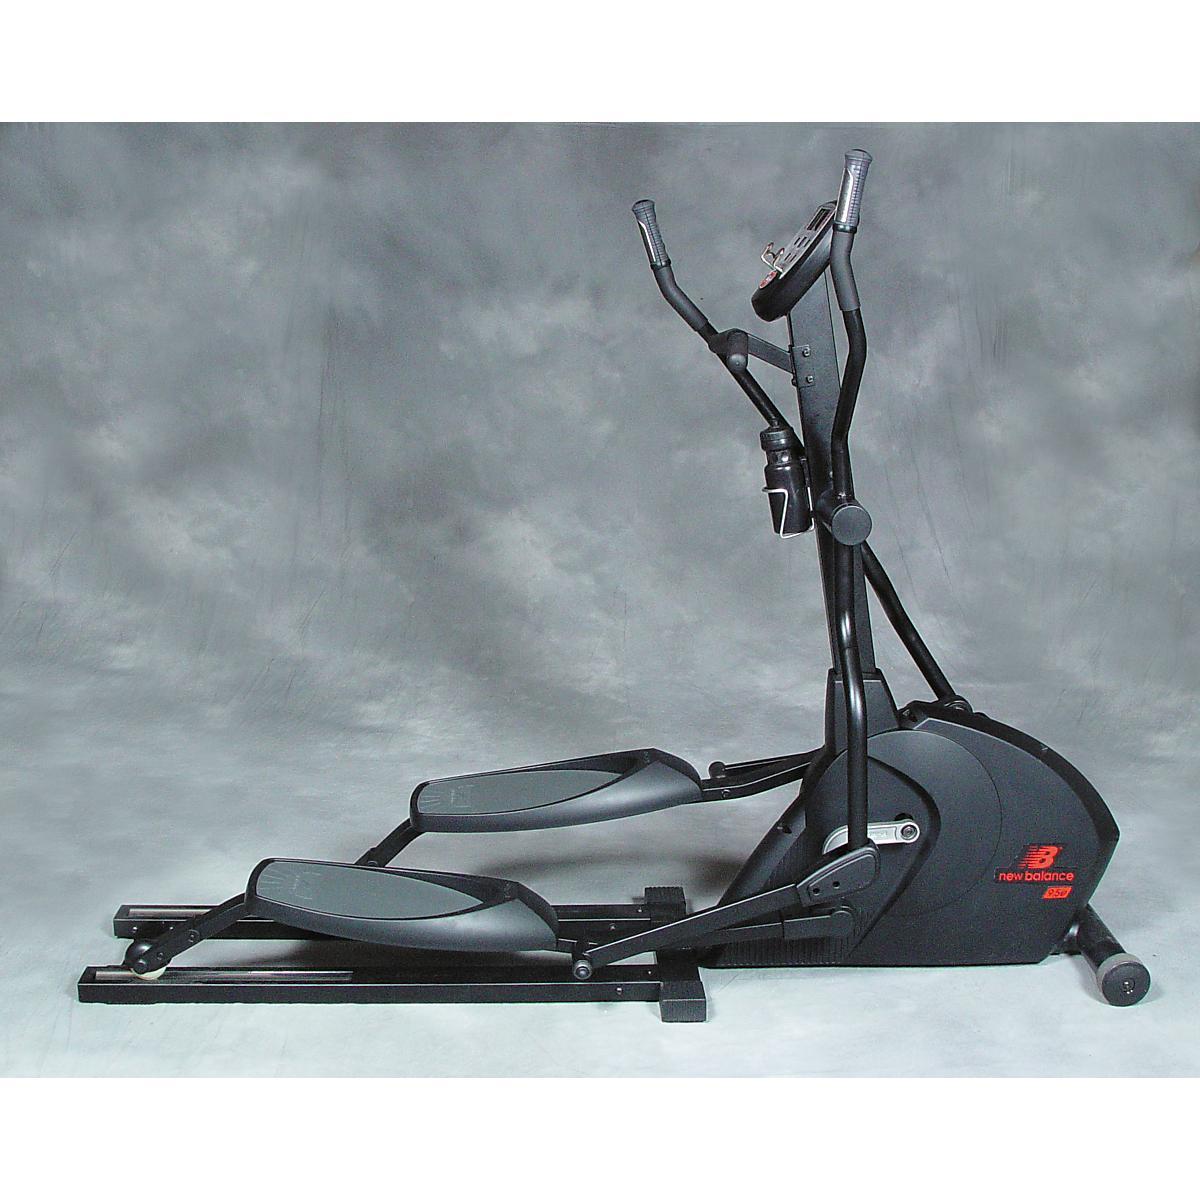 New Balance 9.5e Elliptical Trainer Fitness Equipment At